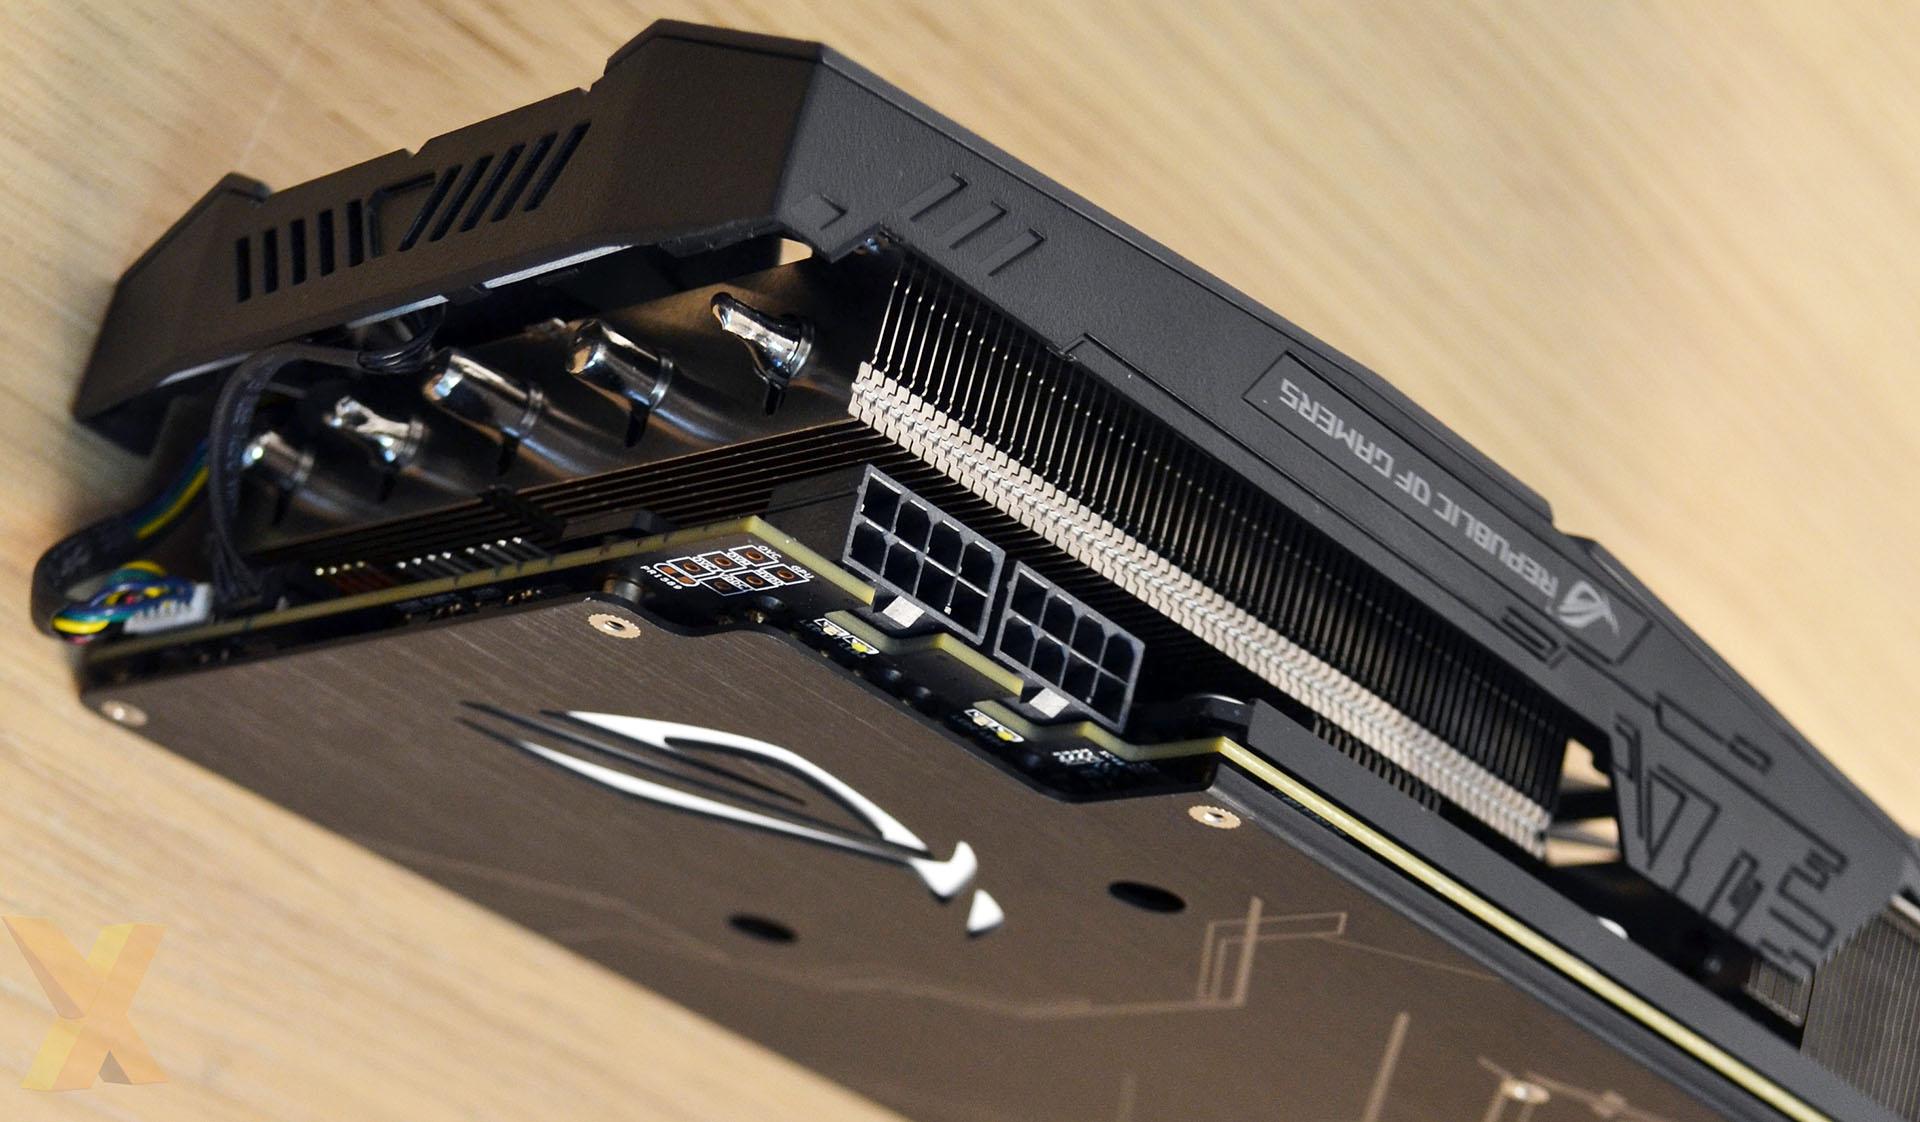 Review: Asus Radeon RX Vega 64 Strix Gaming - Graphics